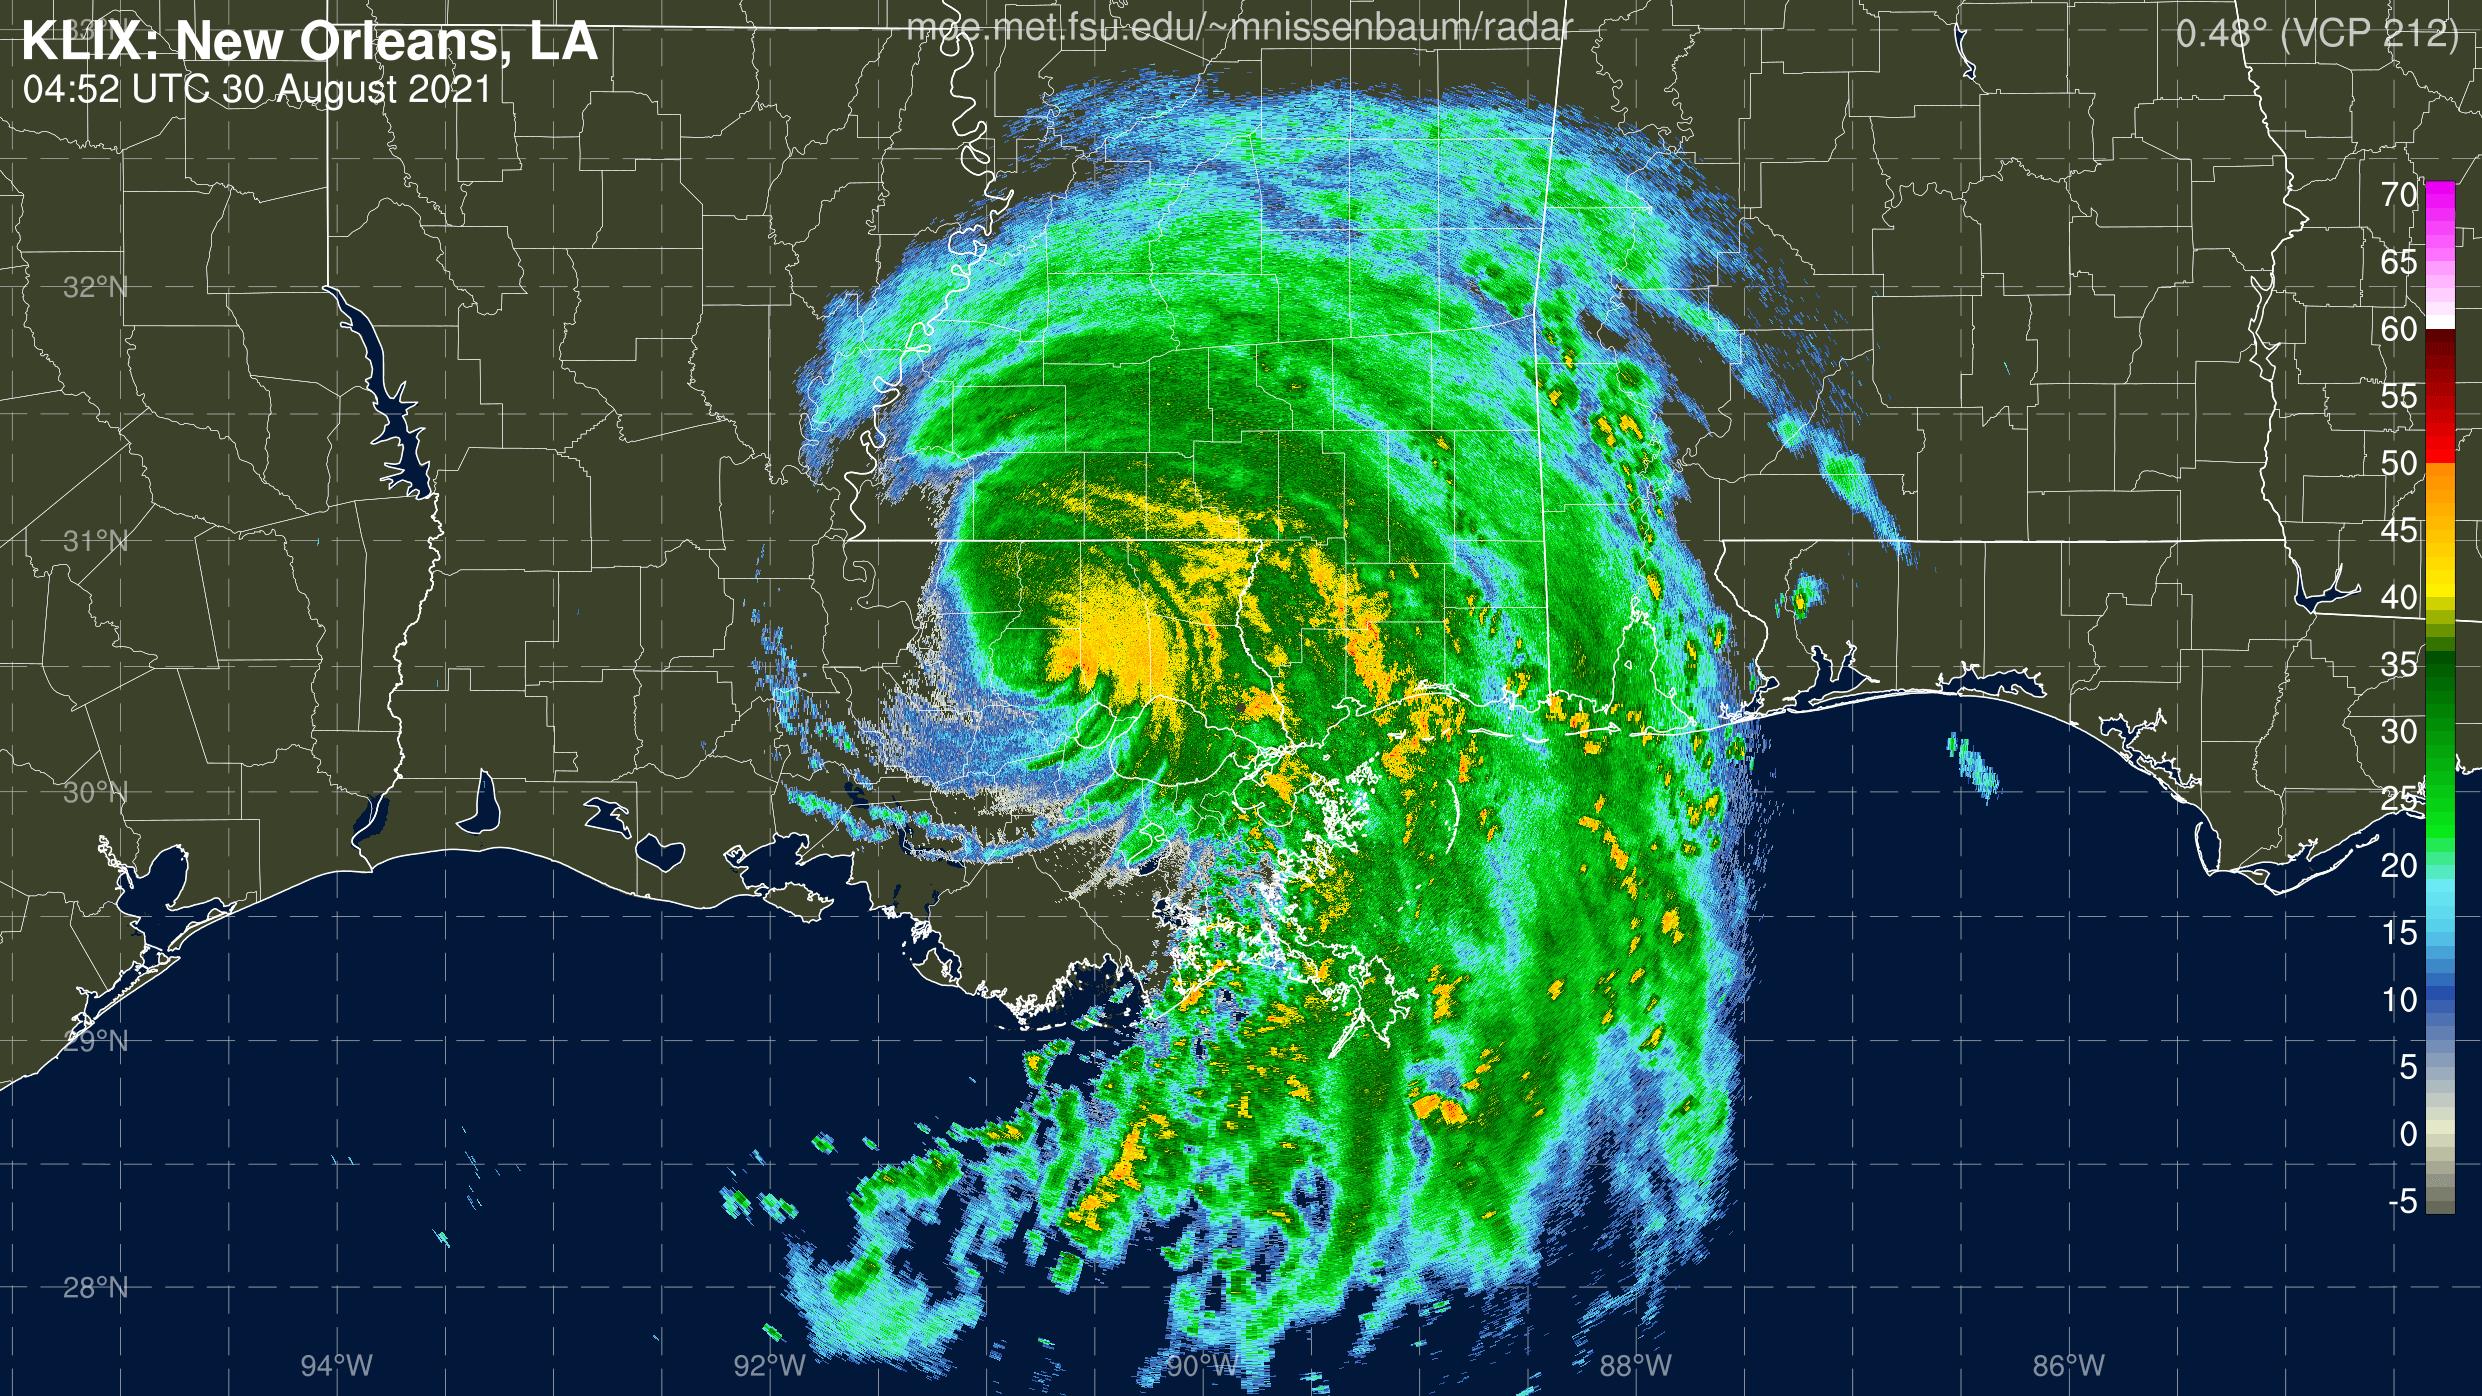 New Orleans Radar Recording From Marc Nissenbaum for Ida (2021)